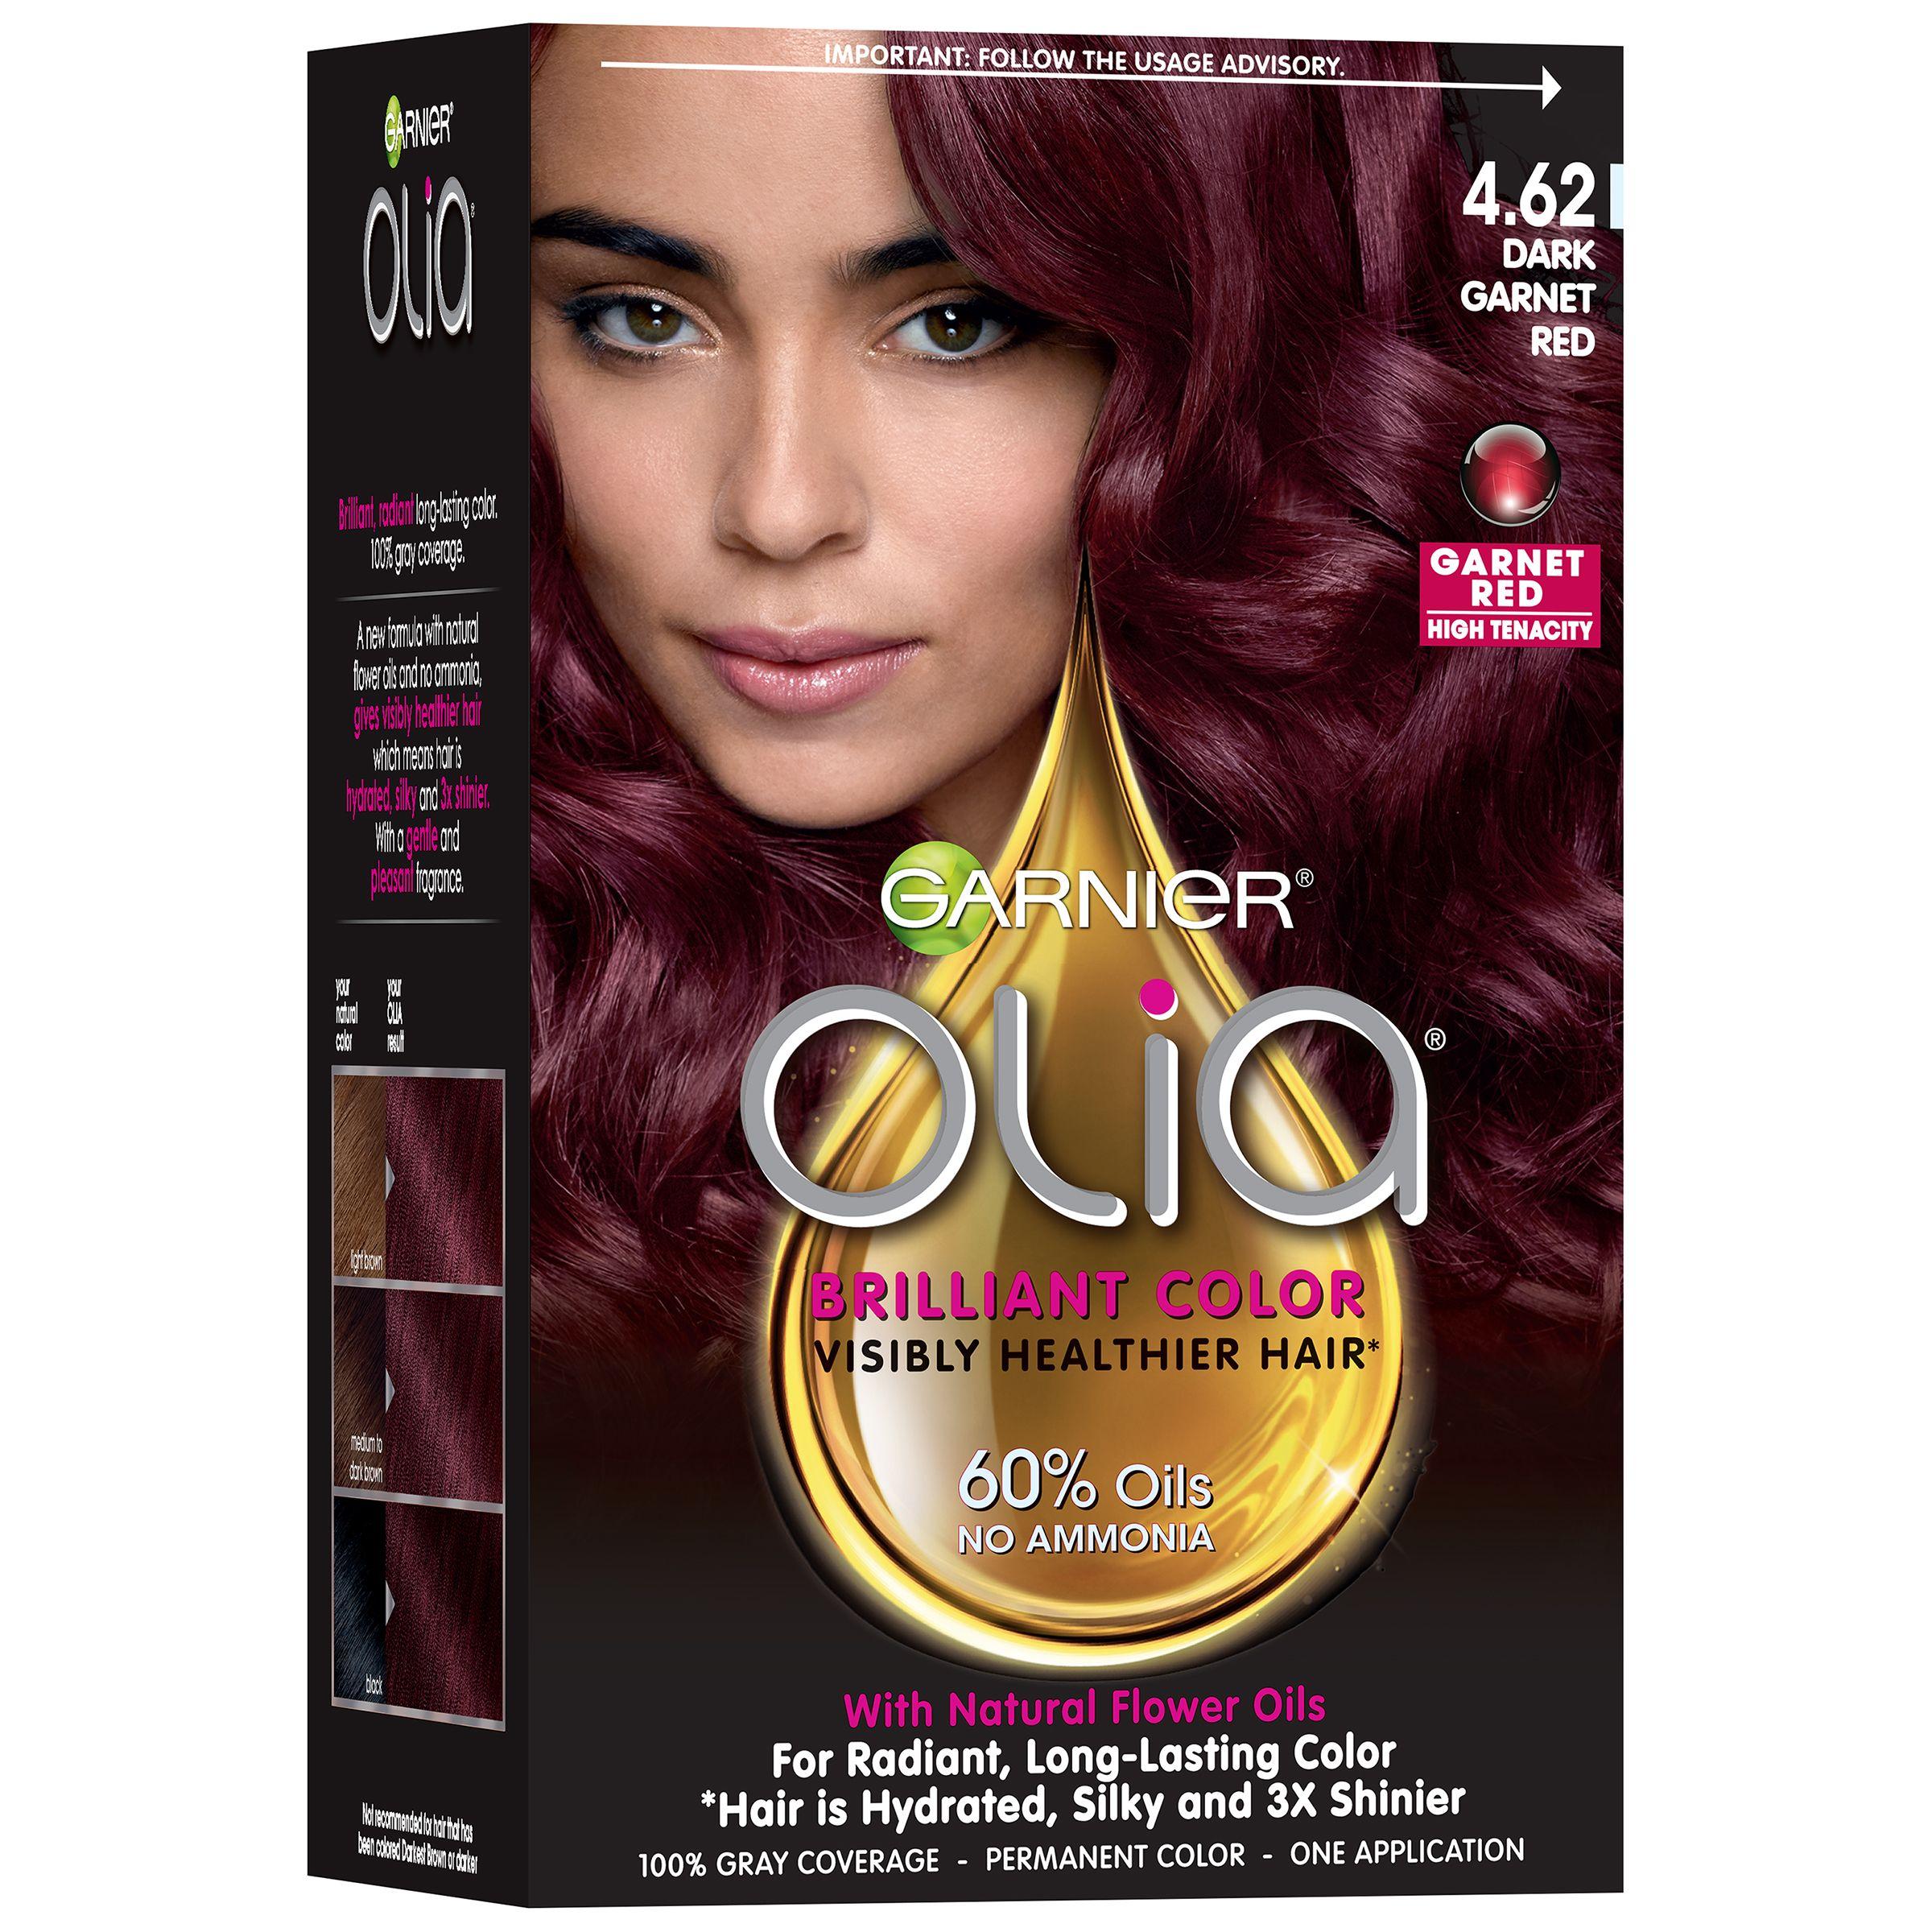 Garnier Olia - a palette of beauty of hair